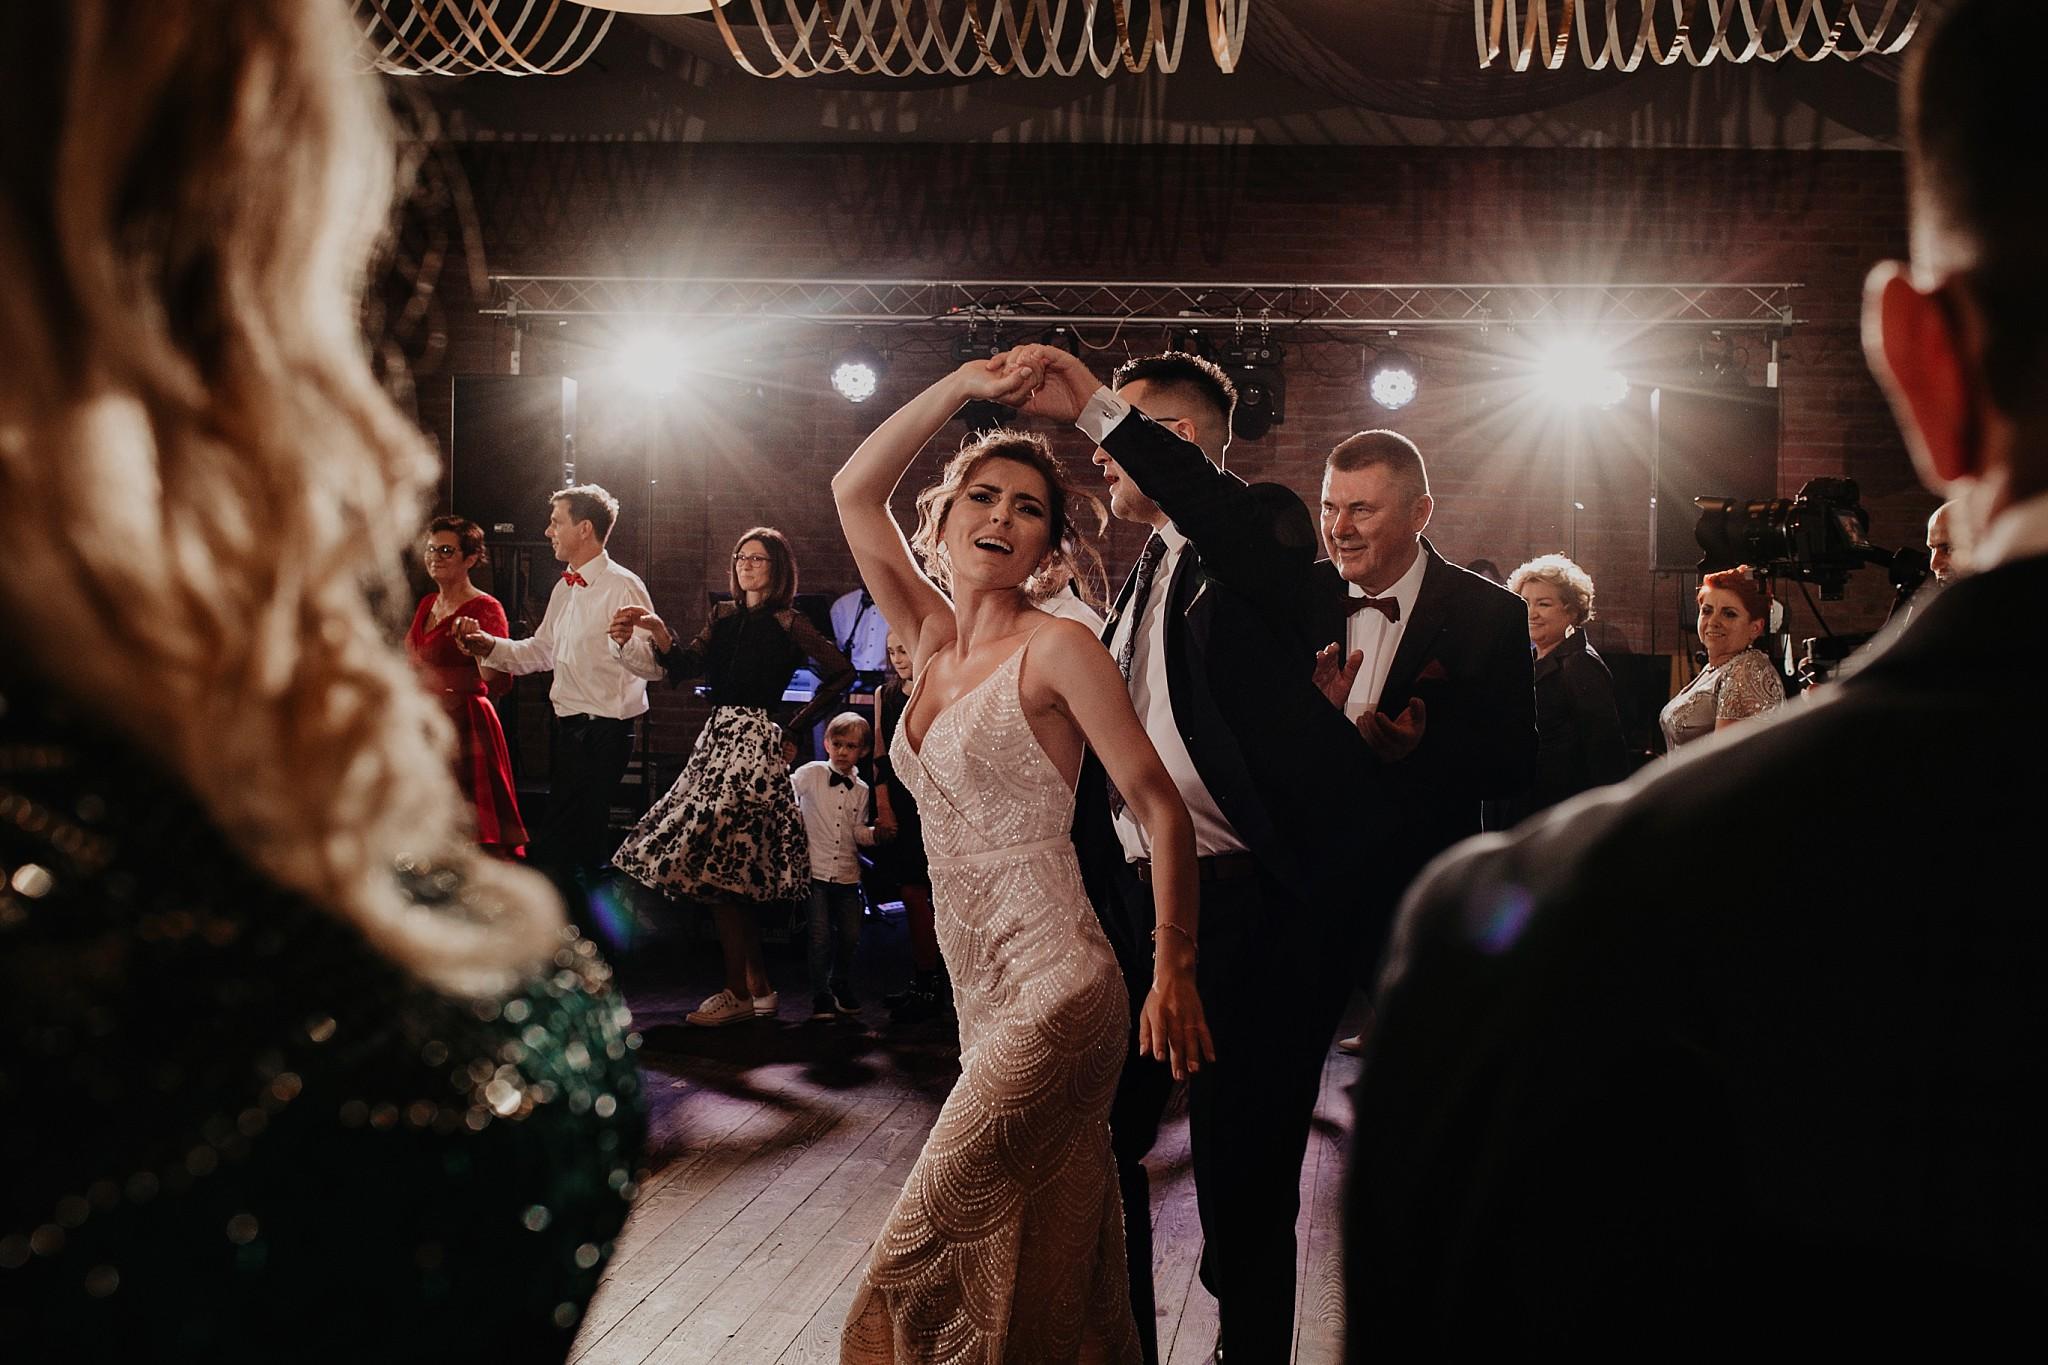 fotograf poznan wesele dobra truskawka piekne wesele pod poznaniem wesele w dobrej truskawce piekna para mloda slub marzen slub koronawirus slub listopad wesele koronawirus 389